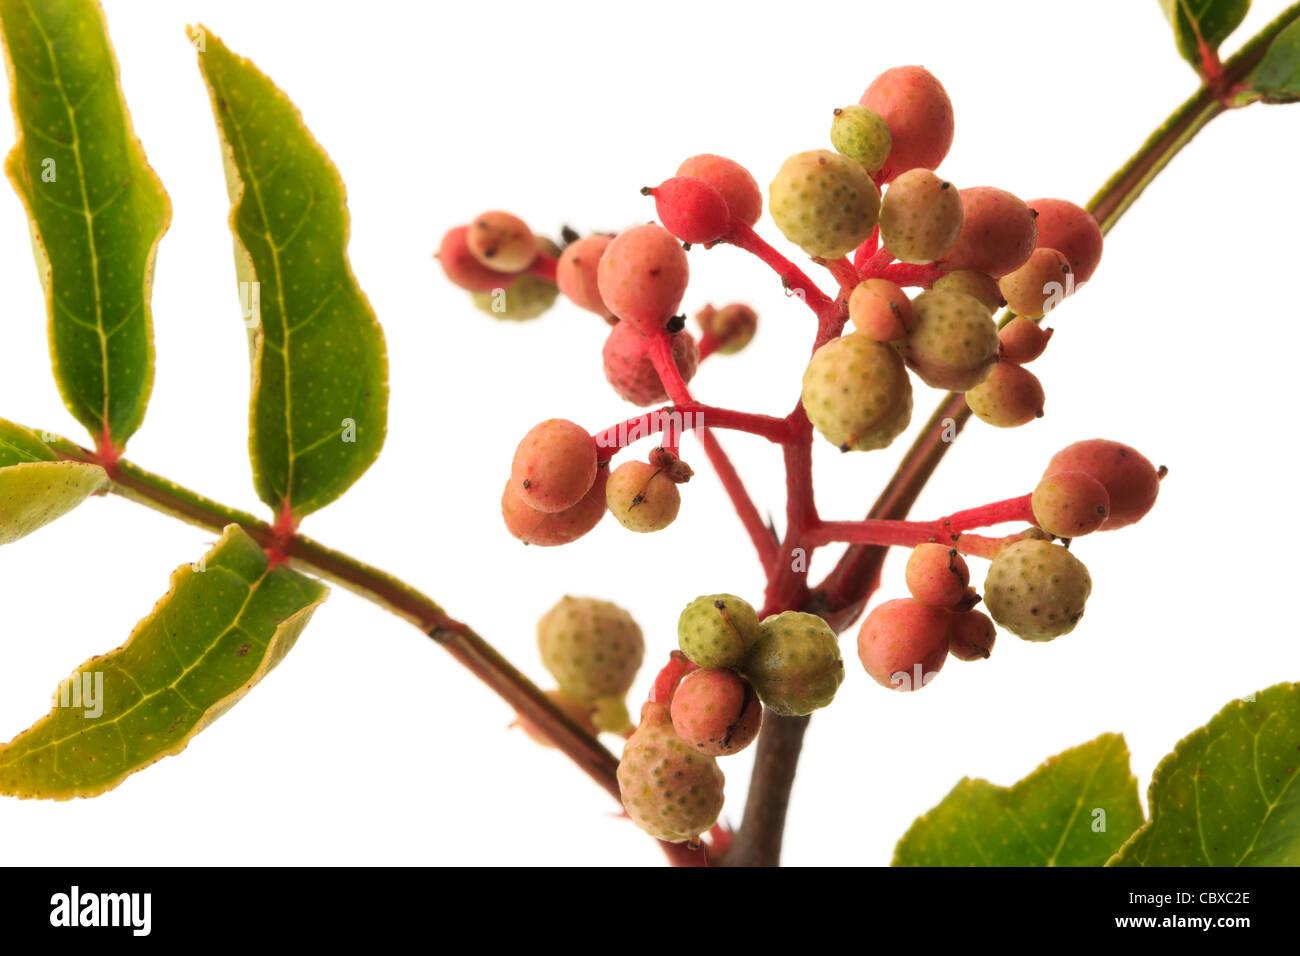 Fruits of Zanthoxylum piperitum, Japanese Pepper Tree, Japan Pepper, Sanshō Stock Photo